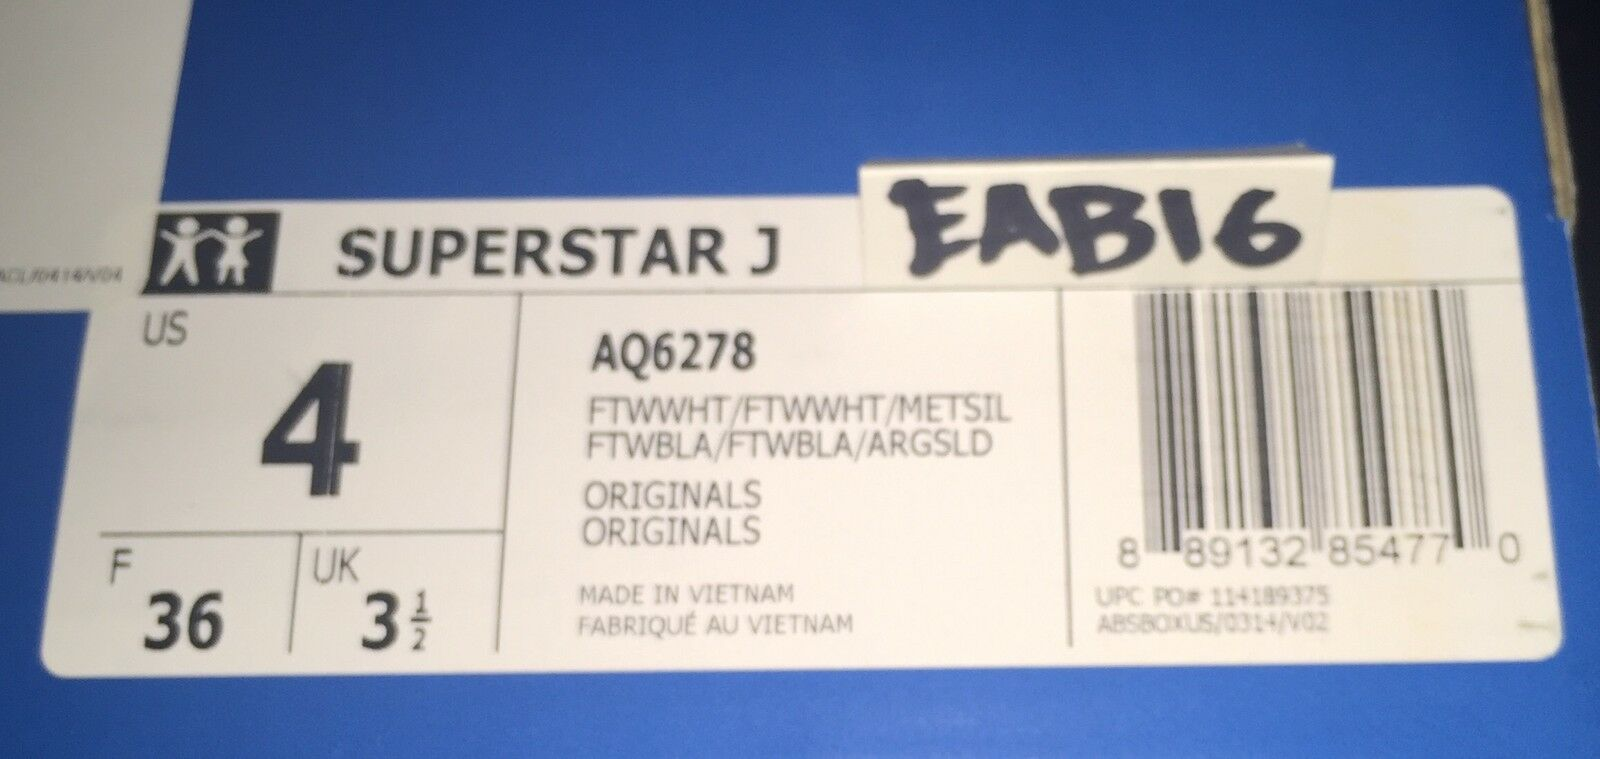 86462d1ca9b4 Adidas Superstar J Junior White Pink Blue Iridescent Hologram AC7705 Shell  Toe - inkFrog